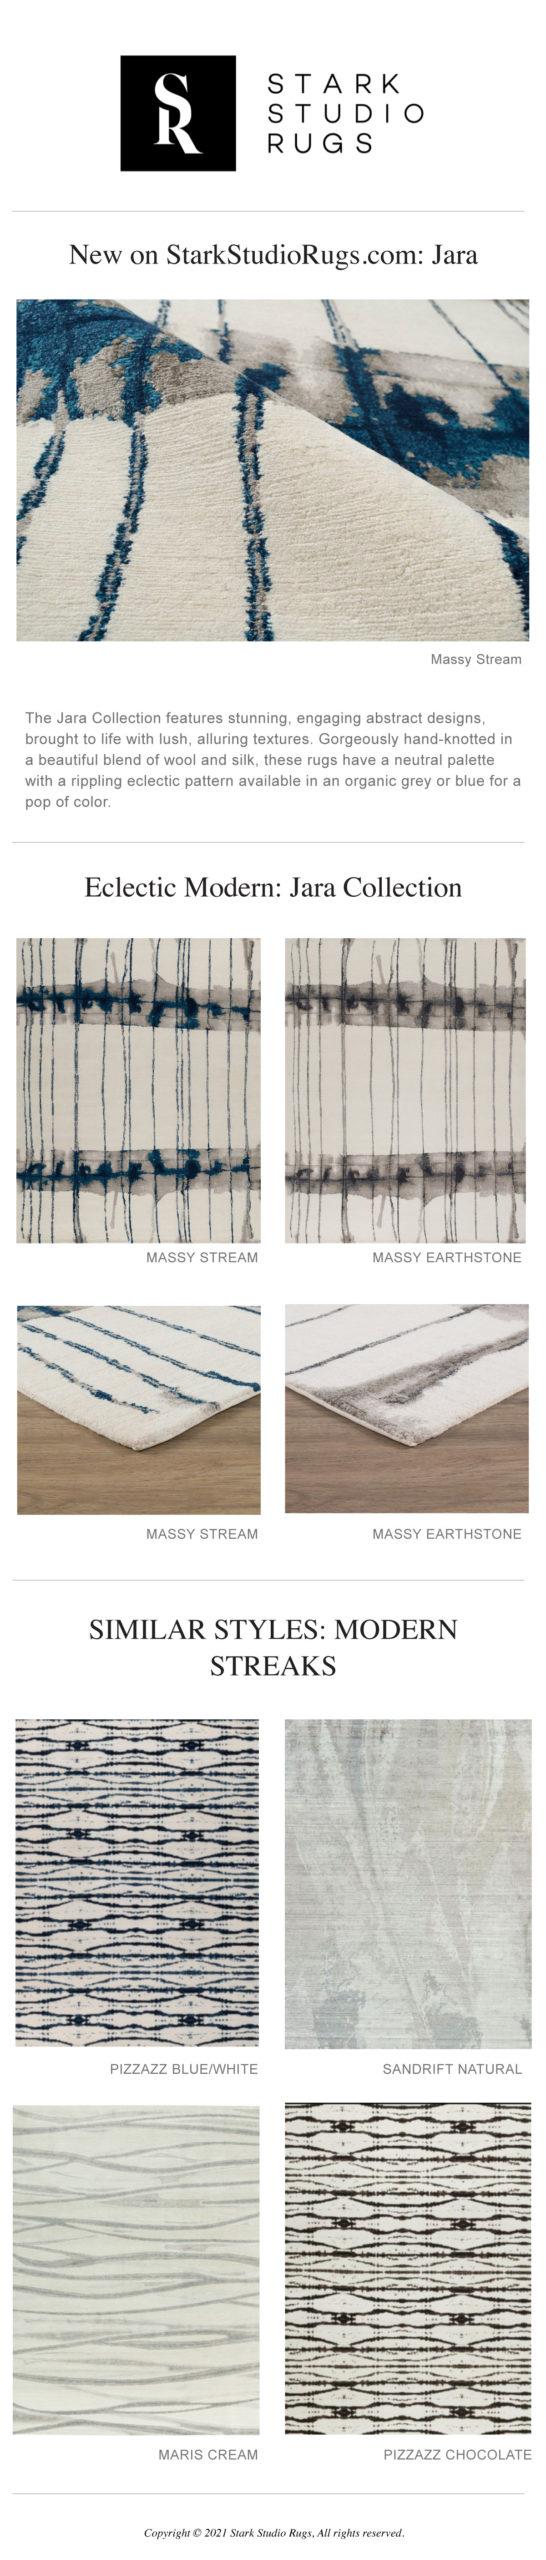 Stark Studio Rugs New Modern Eclectics: Jara Collection